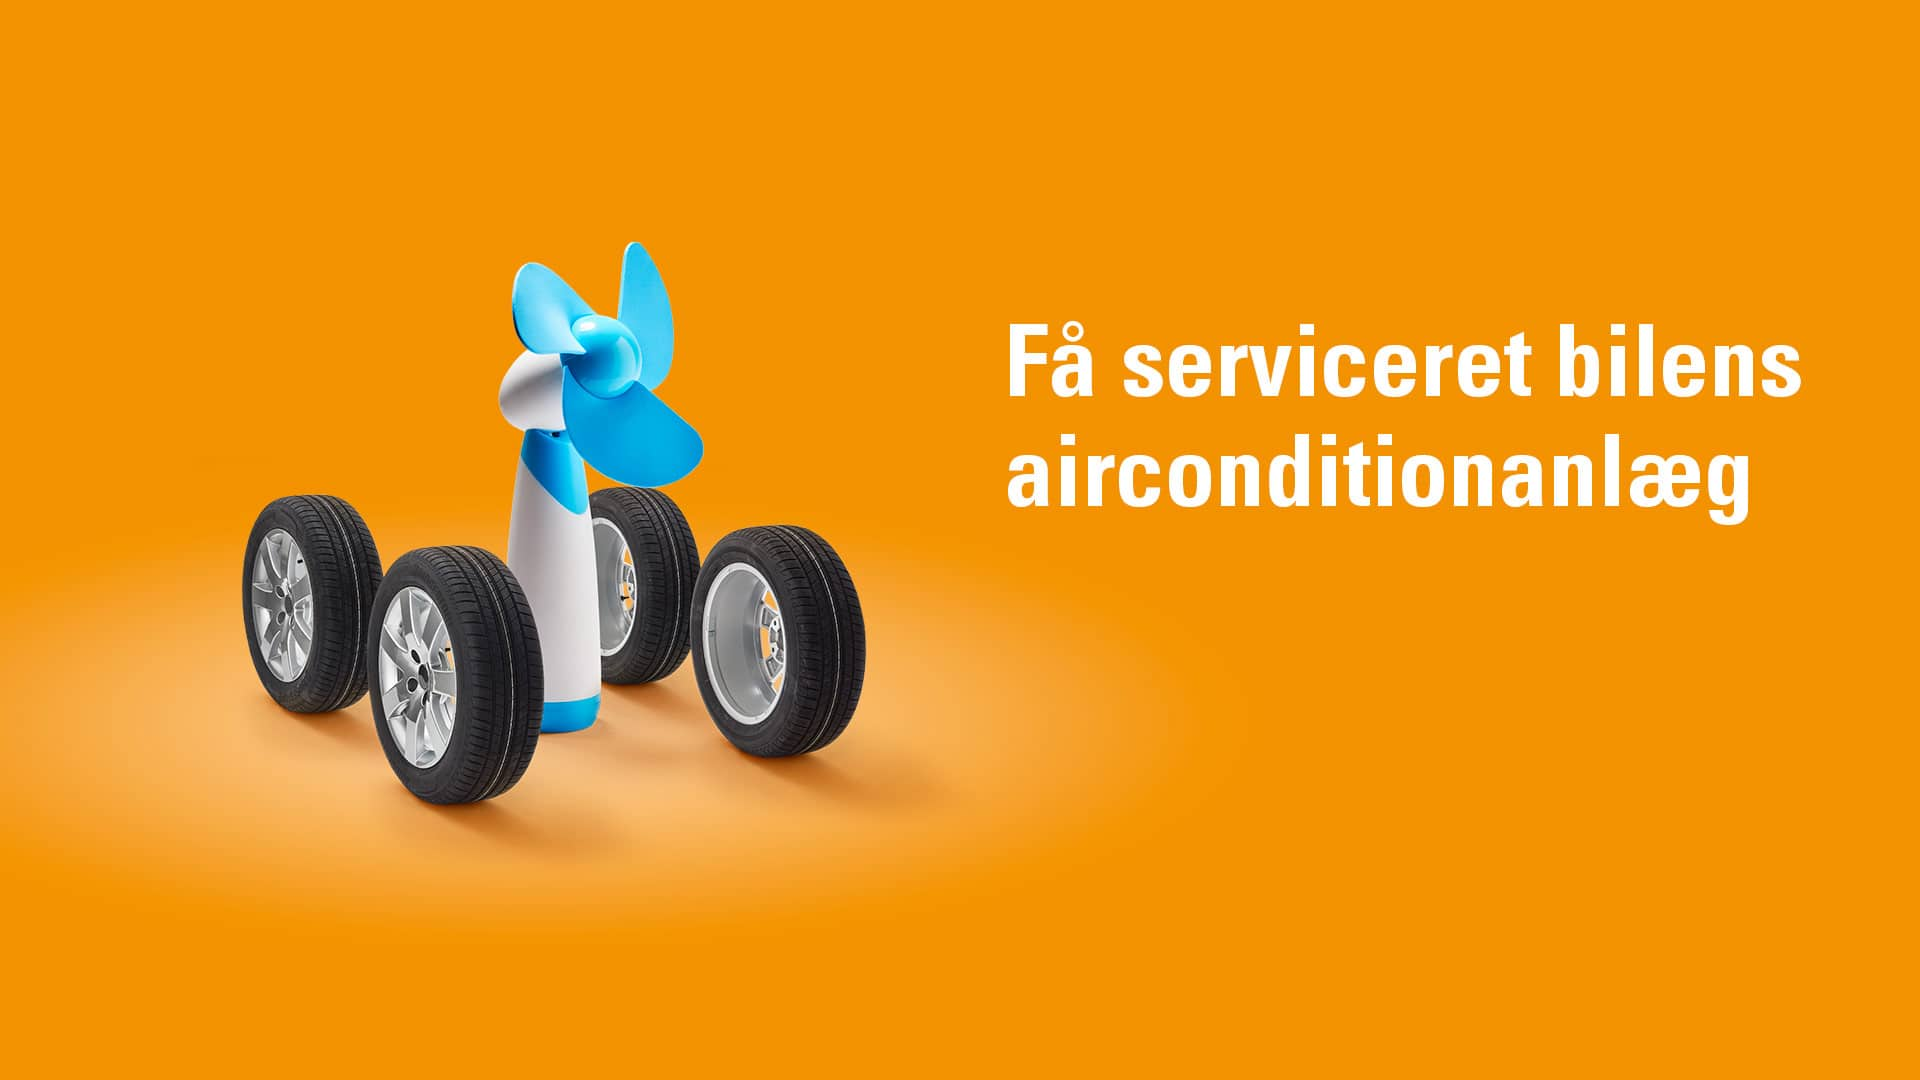 Aircondition-slide